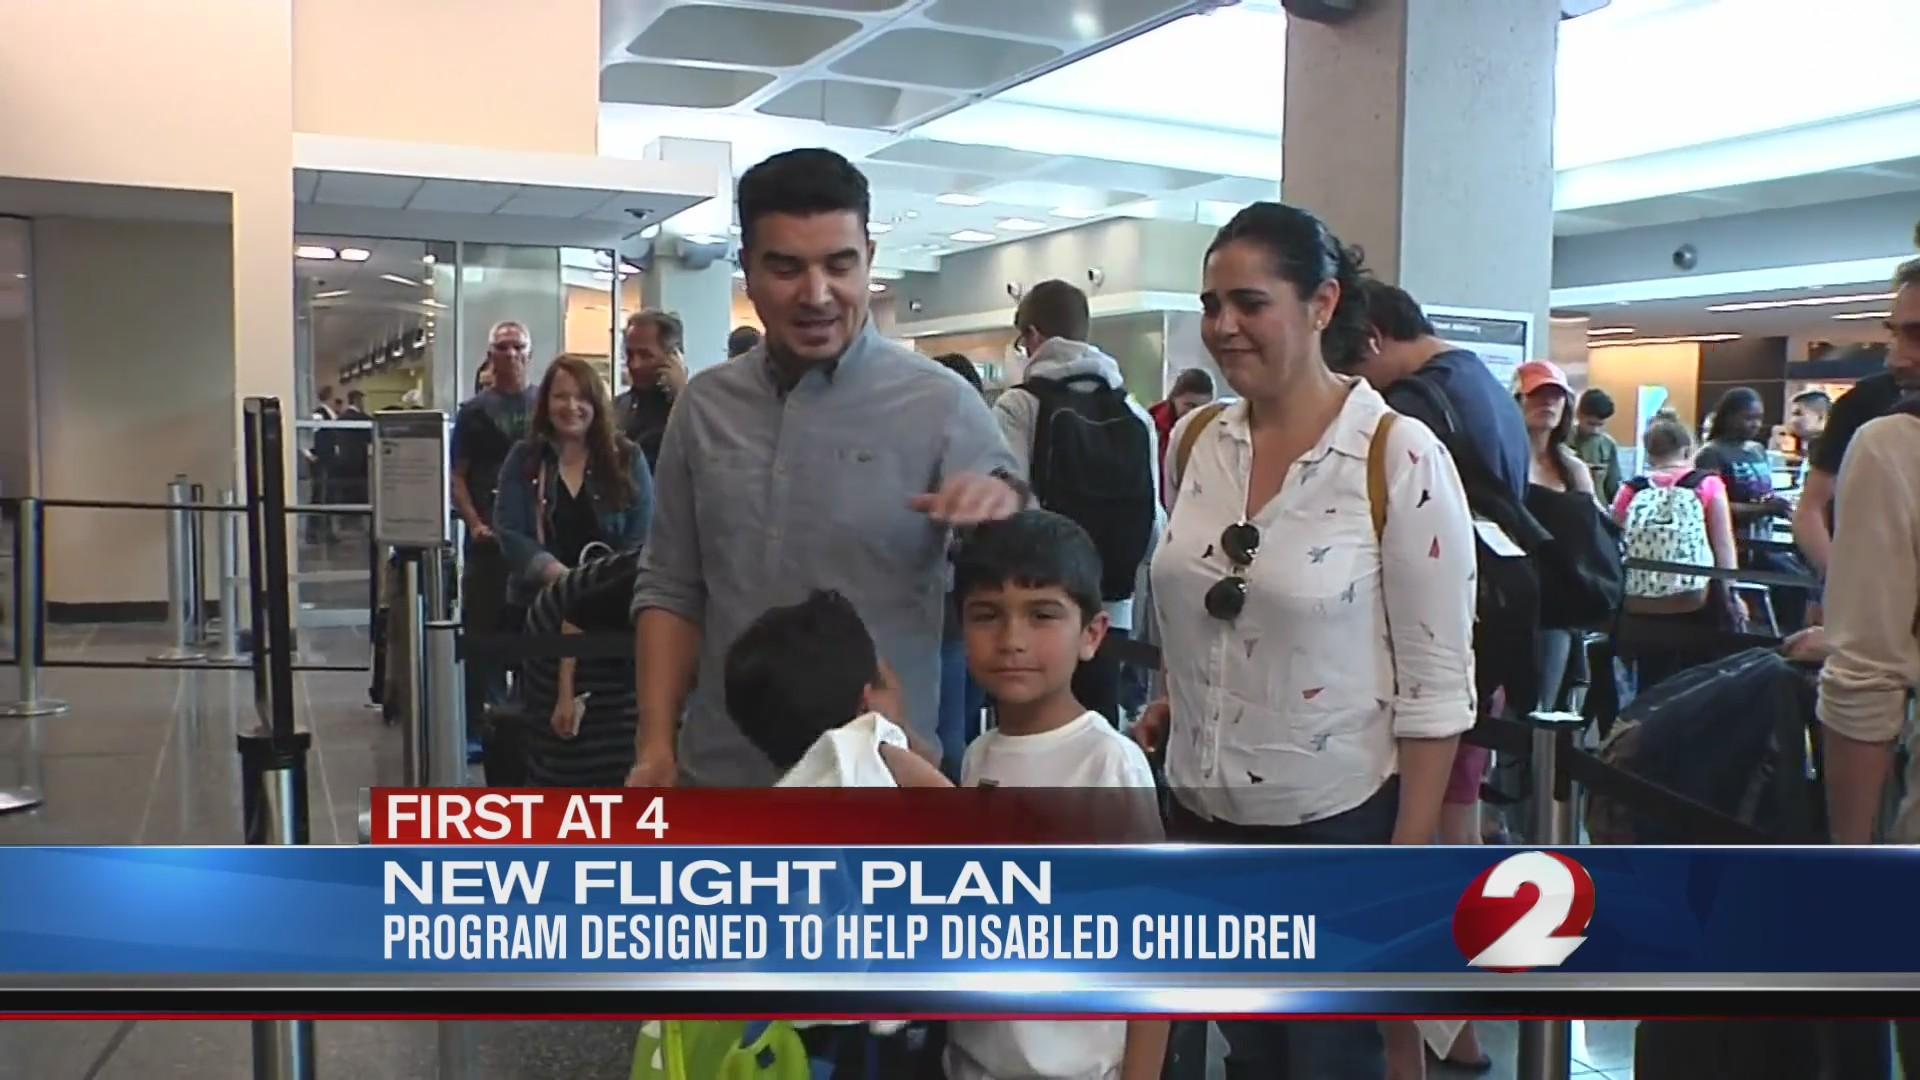 Program designed to help disabled children